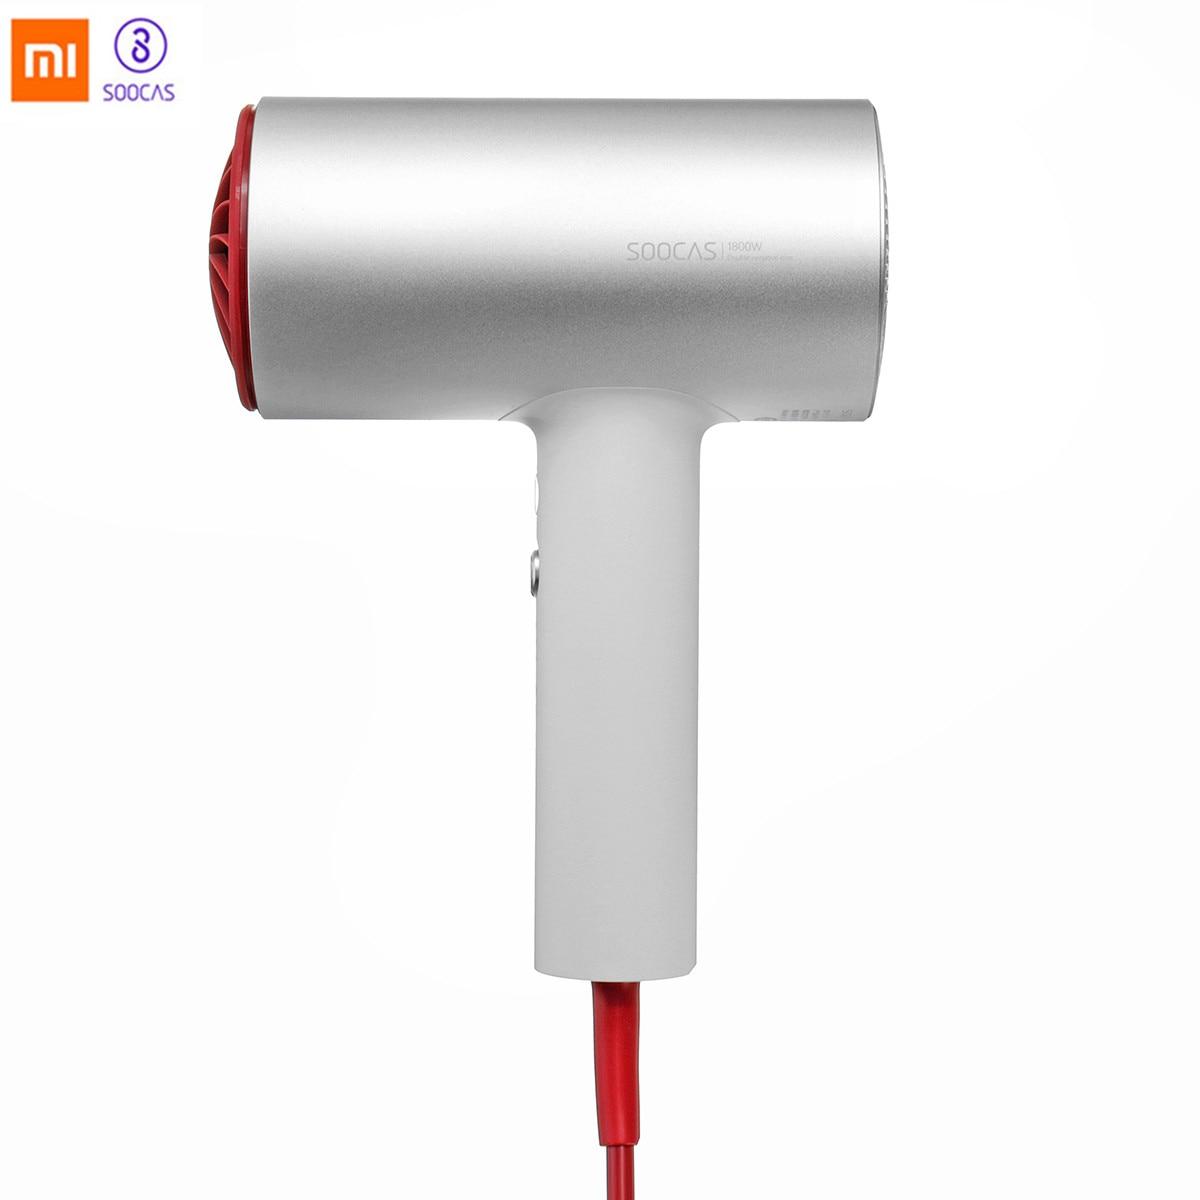 (International Version) Xiaomi Soocas H3 Original Anion Hair Dryer Quick-dry Hair Tools 1800W Air Outlet Anti-Hot Innovative EU цены онлайн